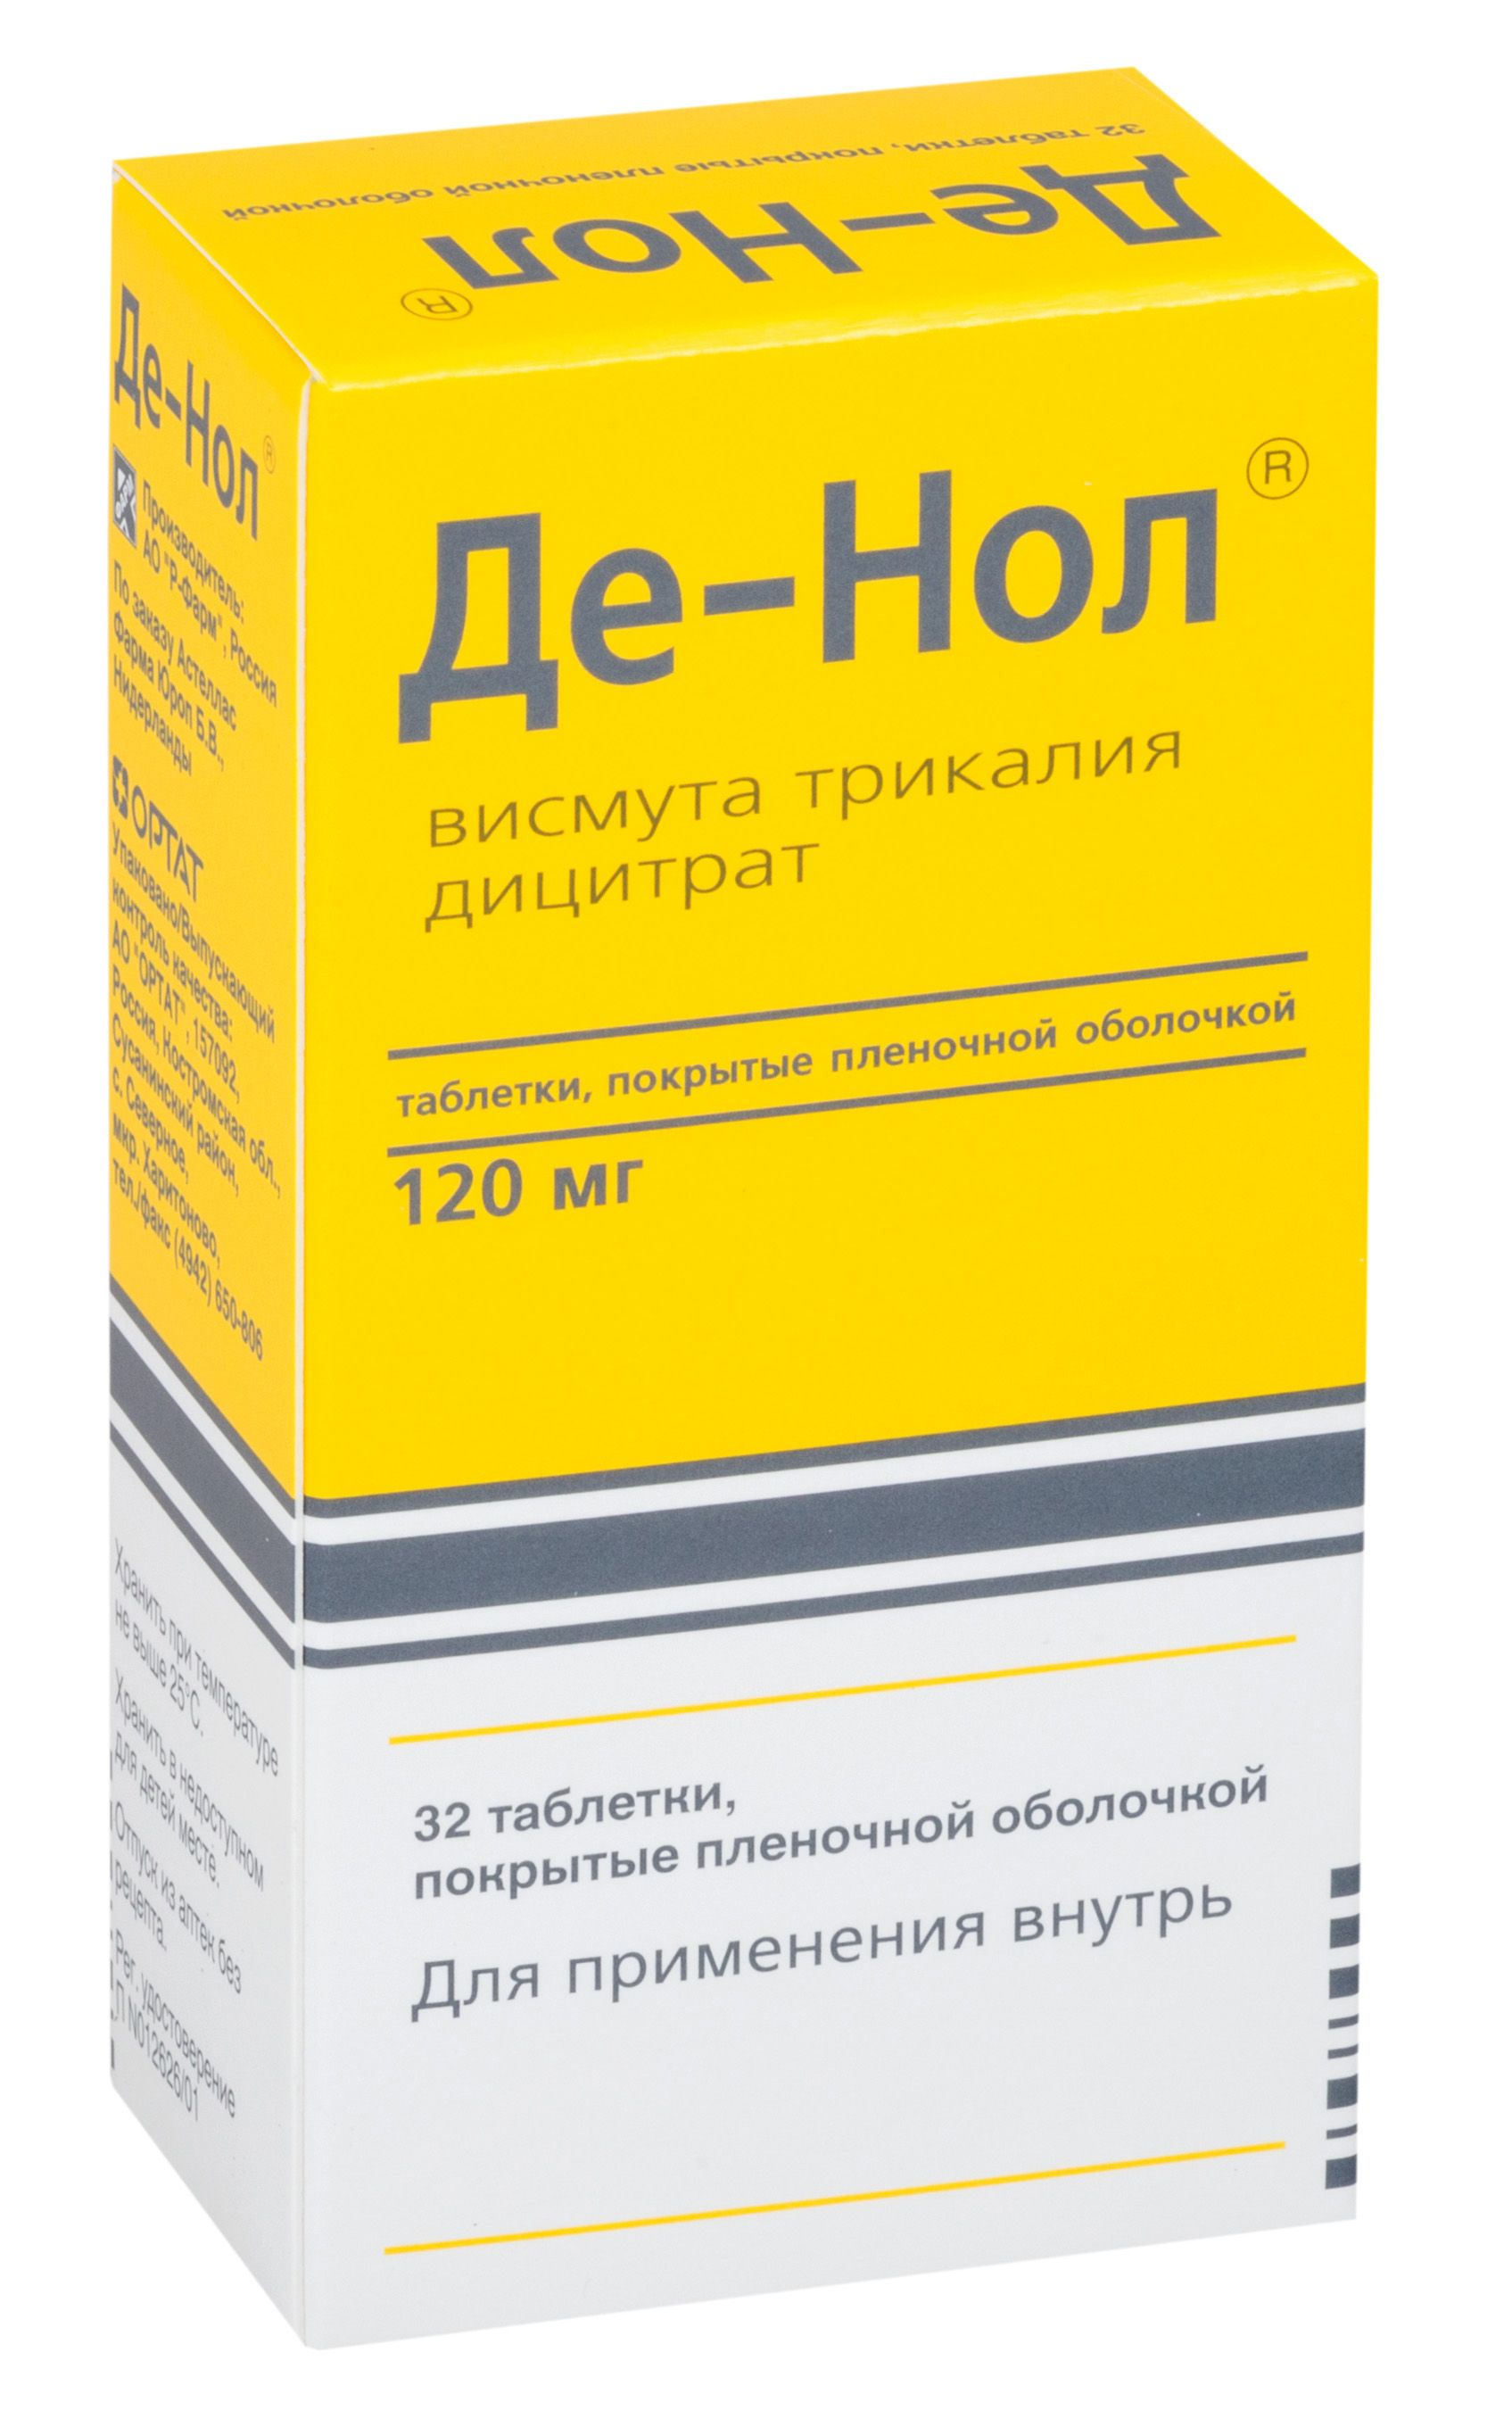 Де-нол - дешевые аналоги и заменители таблеток - medzamena.ru